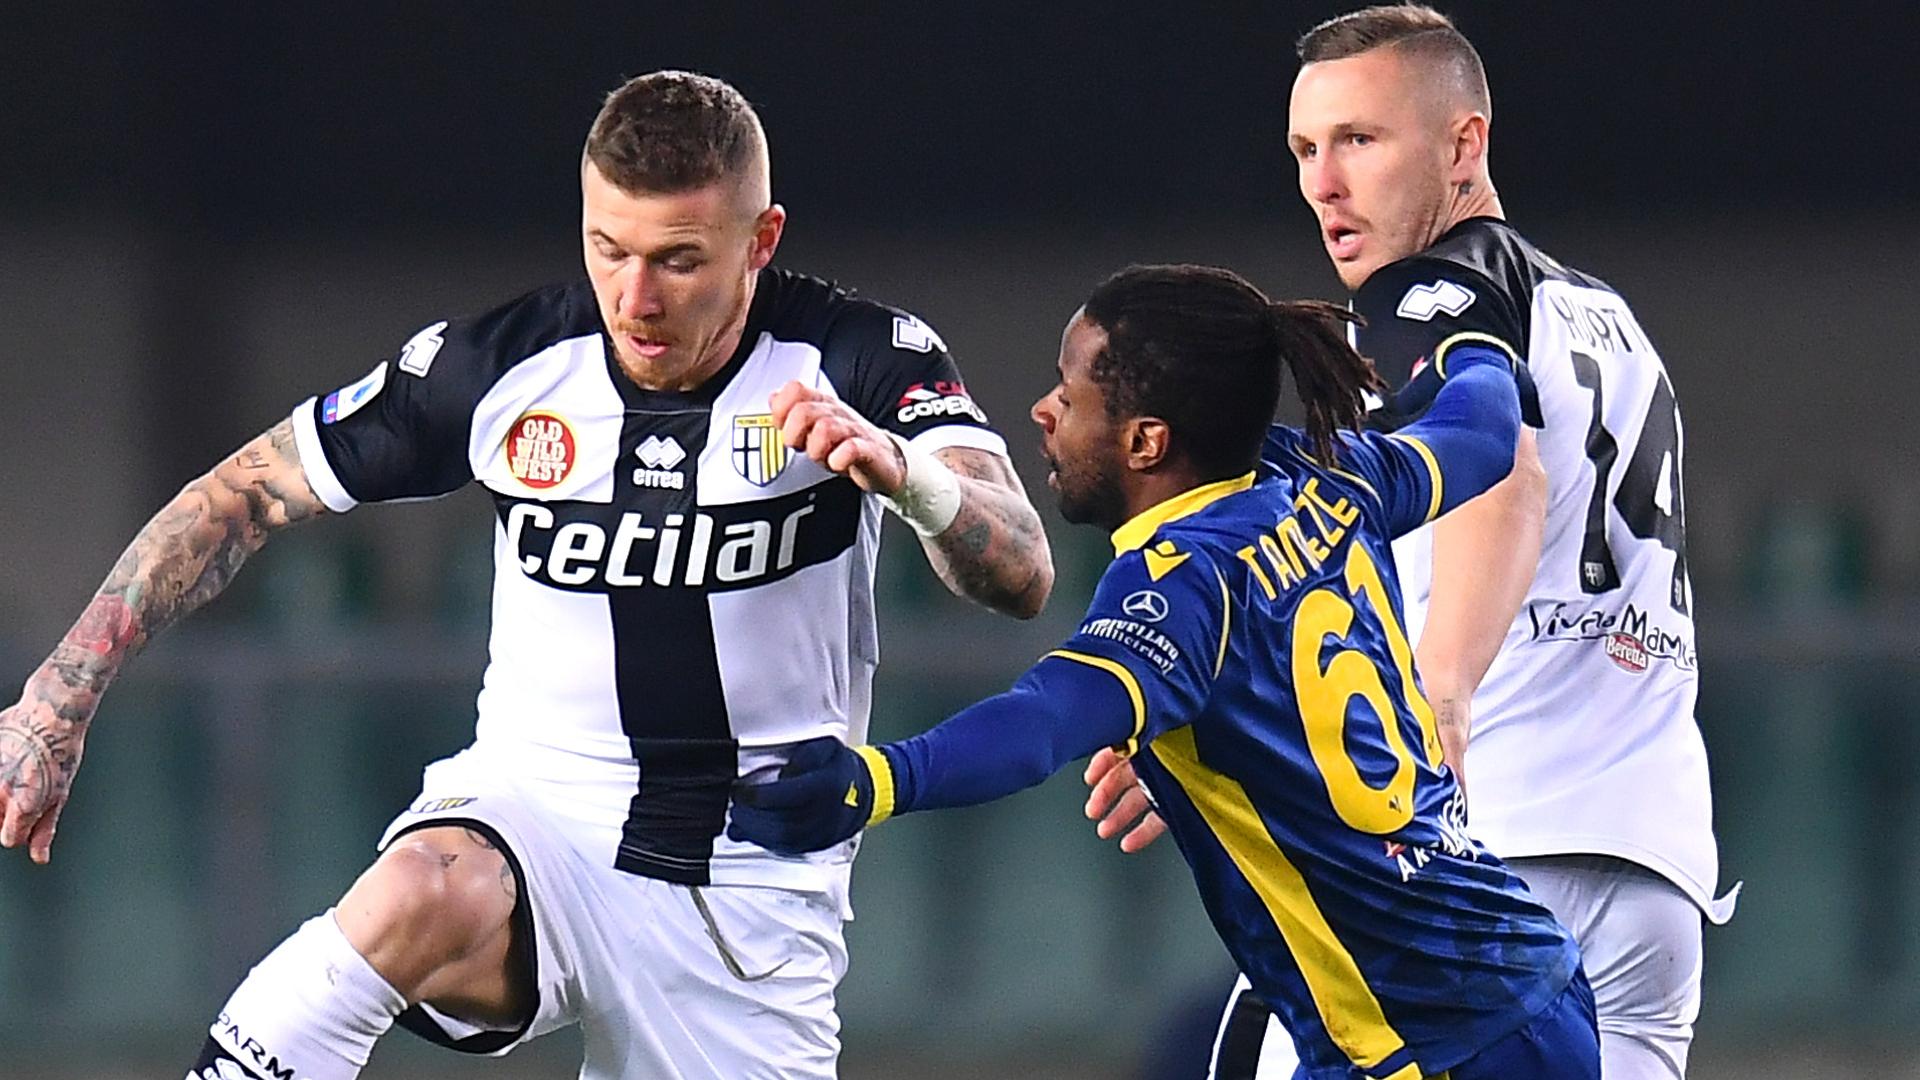 Laporan Pertandingan: Hellas Verona 2-1 Parma | Goal.com